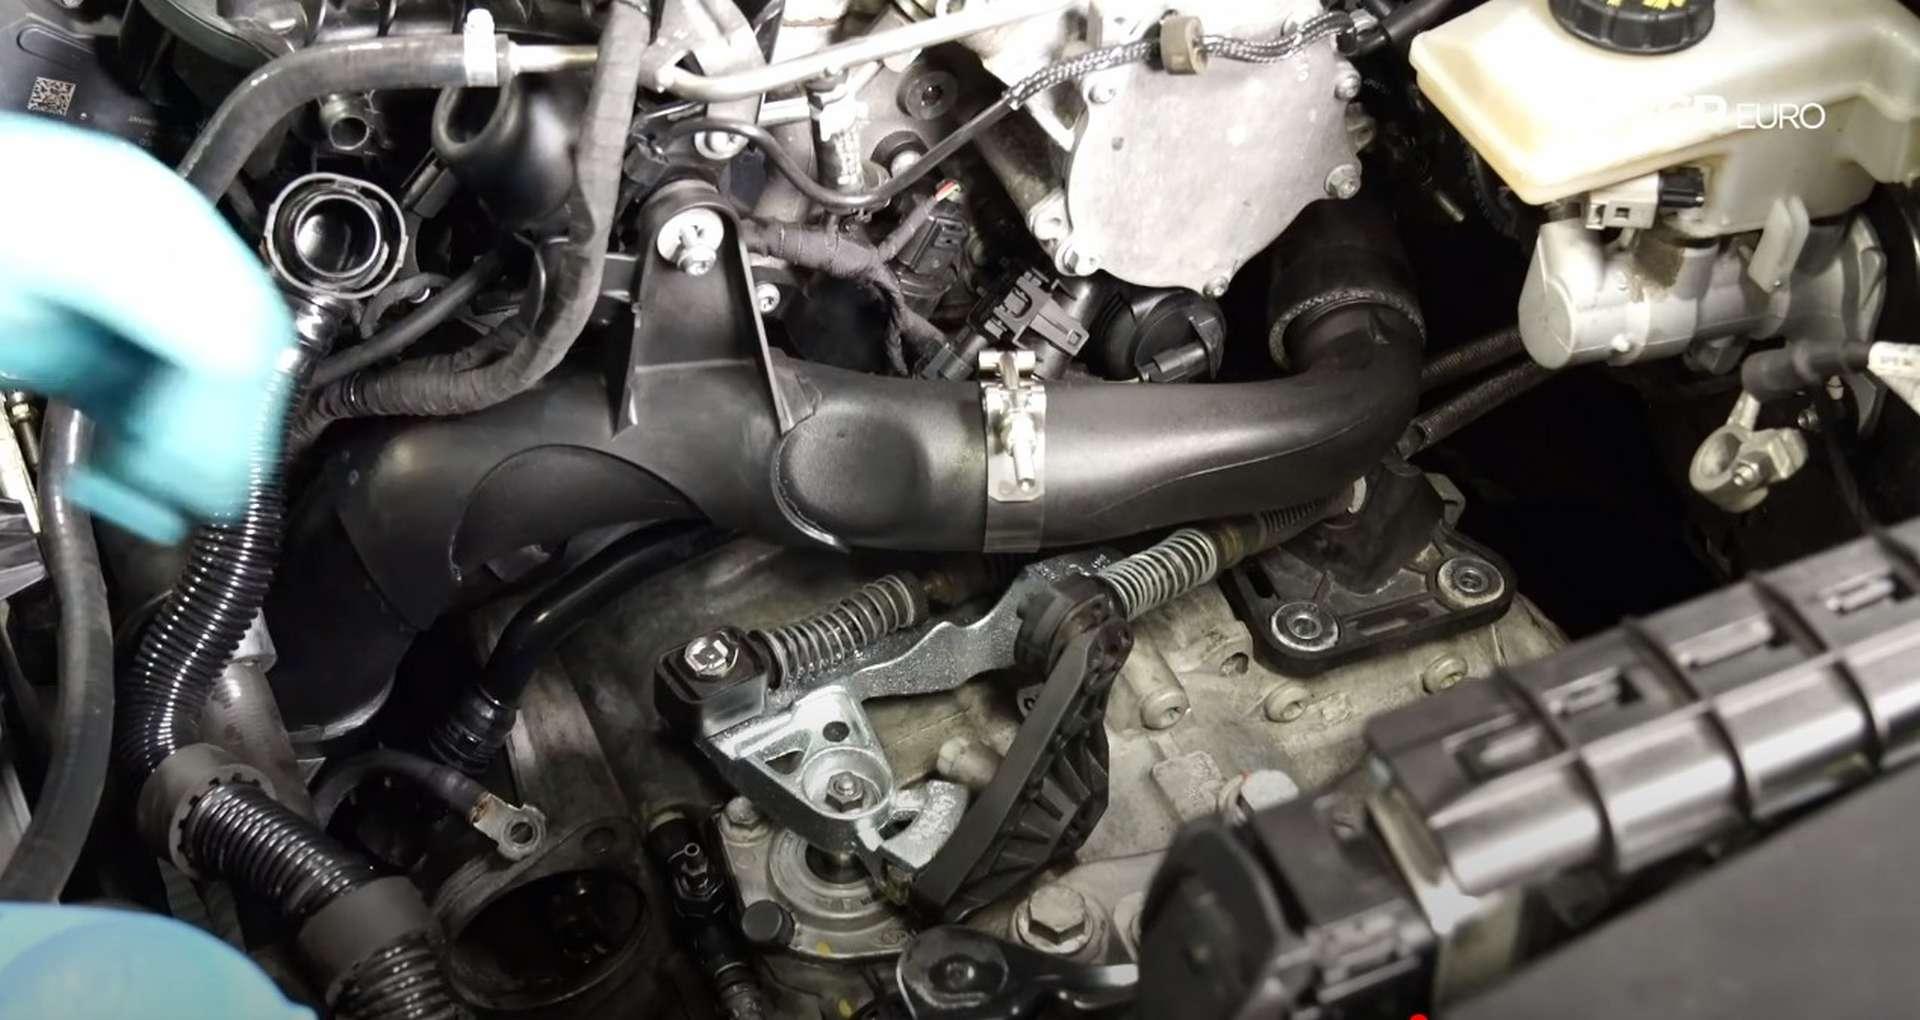 59-DIY_VW_GTI_Clutch-Job-Reinstalling-Starter